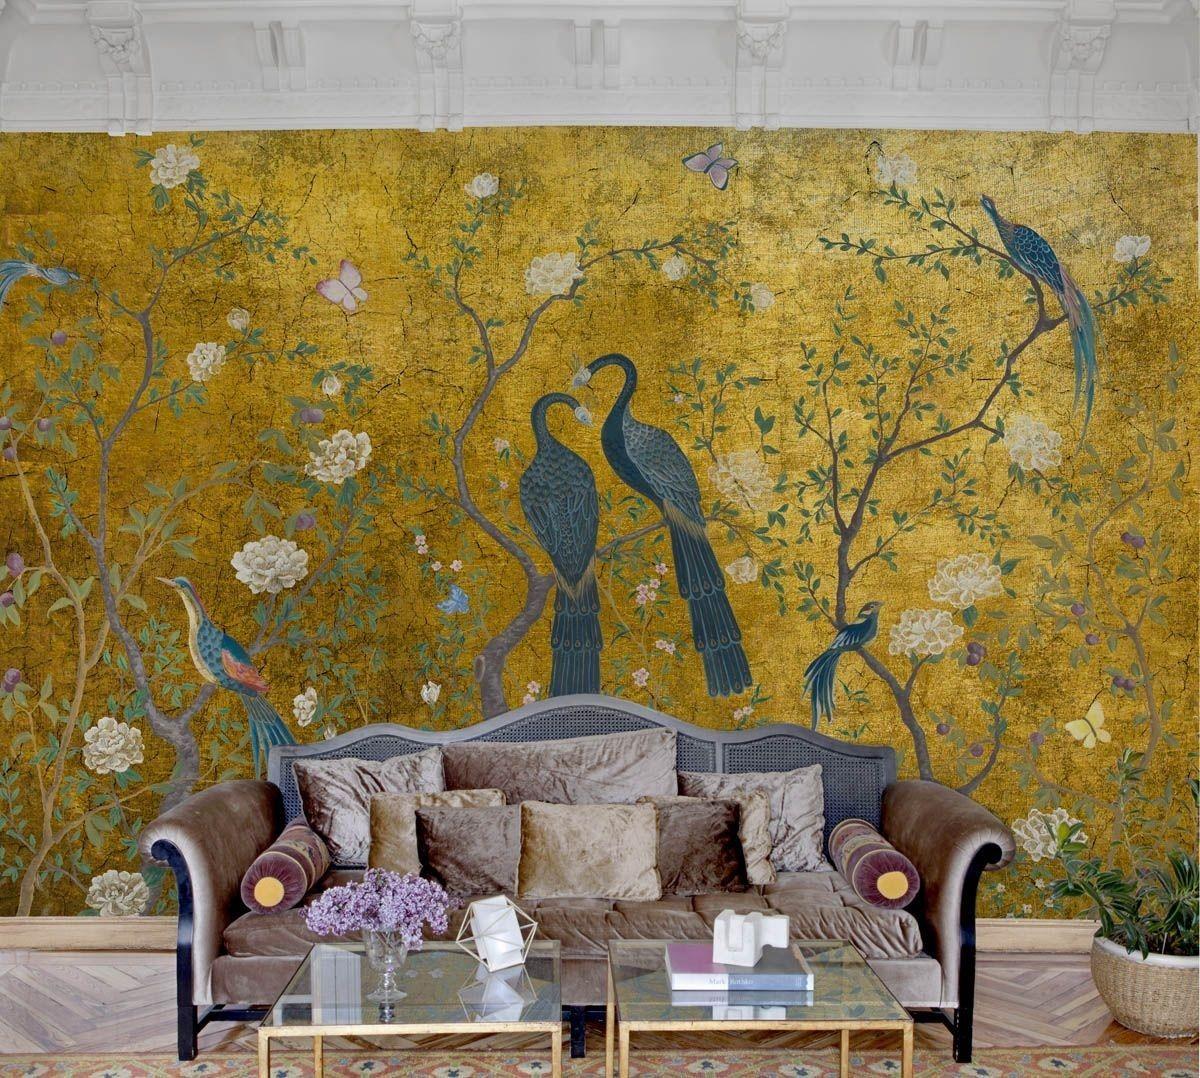 Edo Wall Mural in 2020 Chinoiserie wallpaper, Wall decor